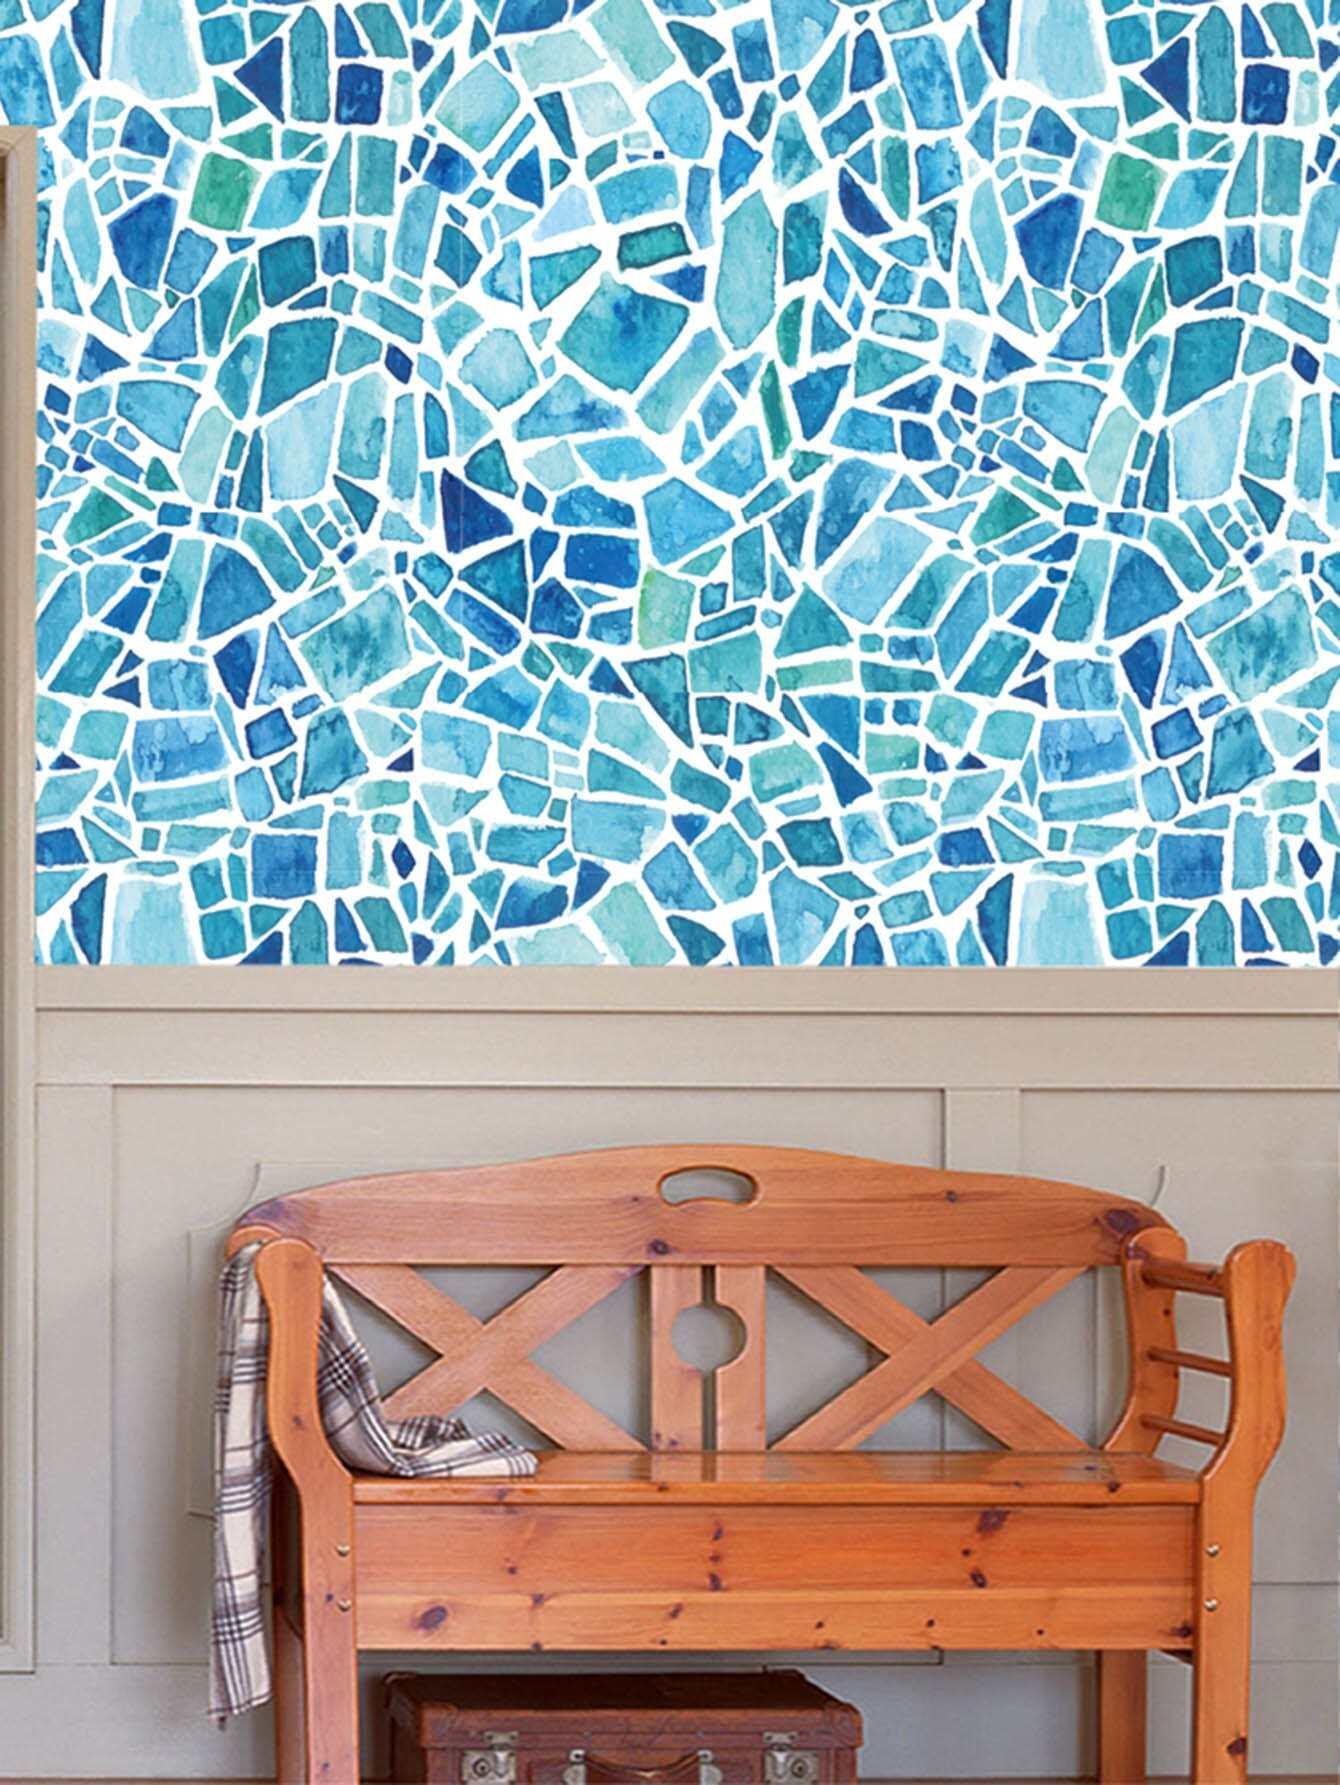 Asymmetric Stone Ceramic Tile Sticker 5pcs random cartoon ceramic tile decal 1pc